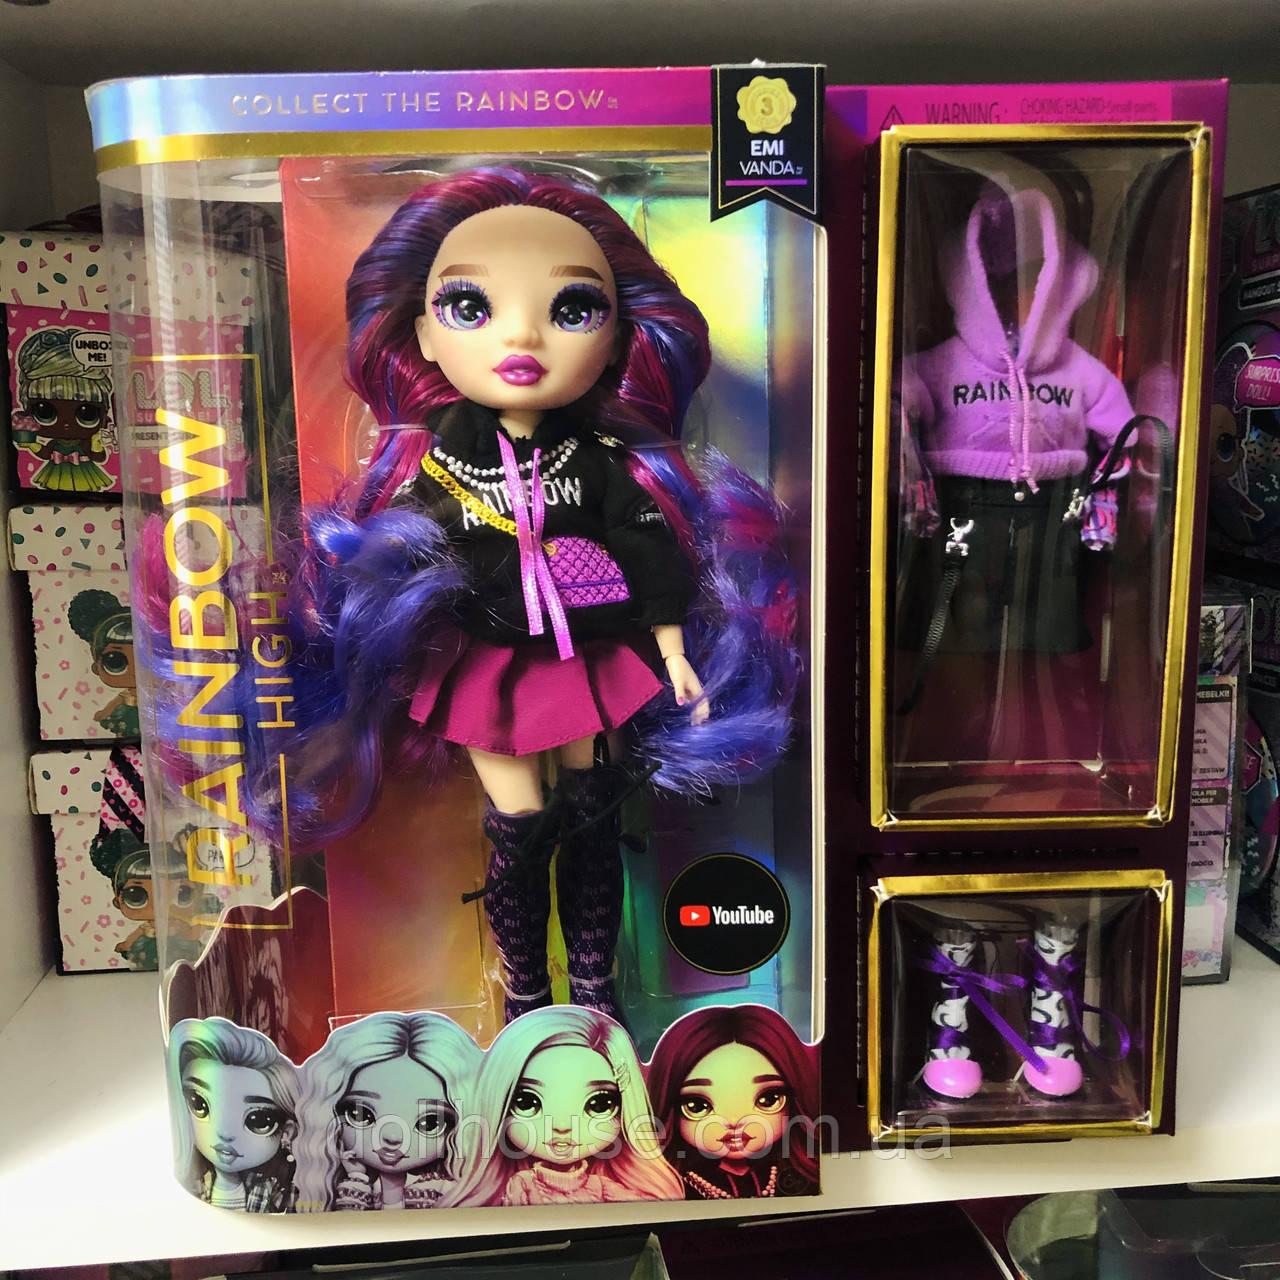 Лялька Rainbow high s3 - Орхідея Orchid doll EMI Vanda